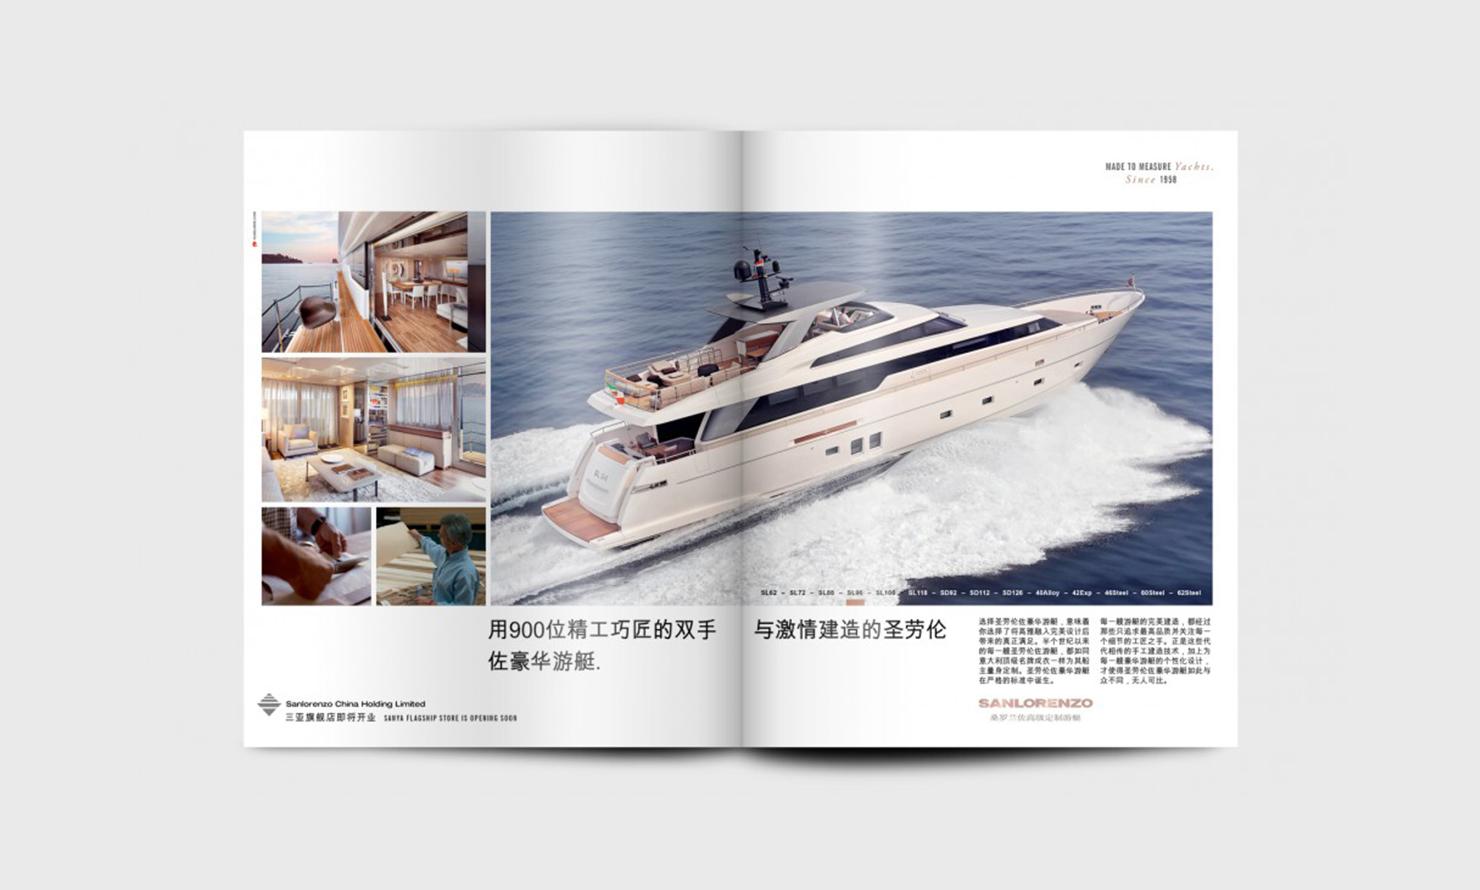 https://www.kubelibre.com/uploads/Slider-work-tutti-clienti/sanlorenzo-yacht-made-to-measure-yacht-since-1958-3.jpg